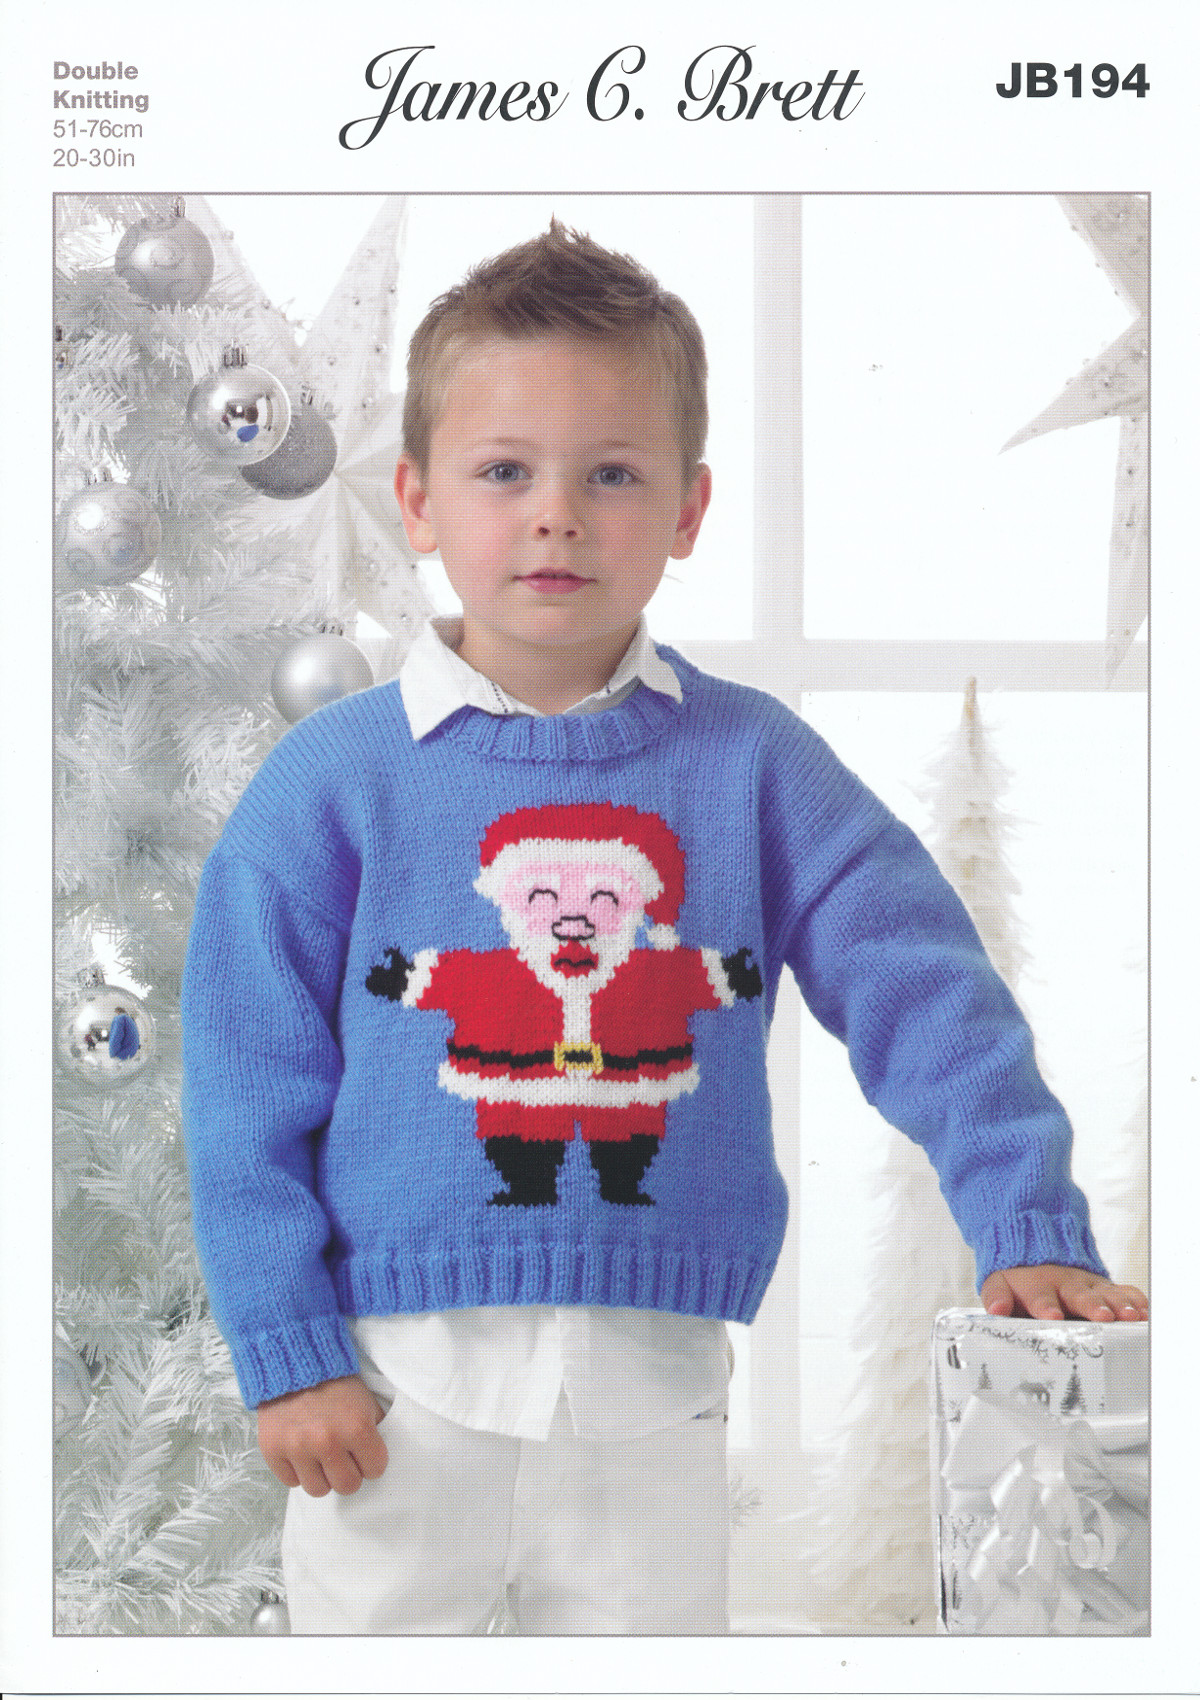 Christmas Jumper Knitting Patterns : James brett double knitting pattern kids christmas santa